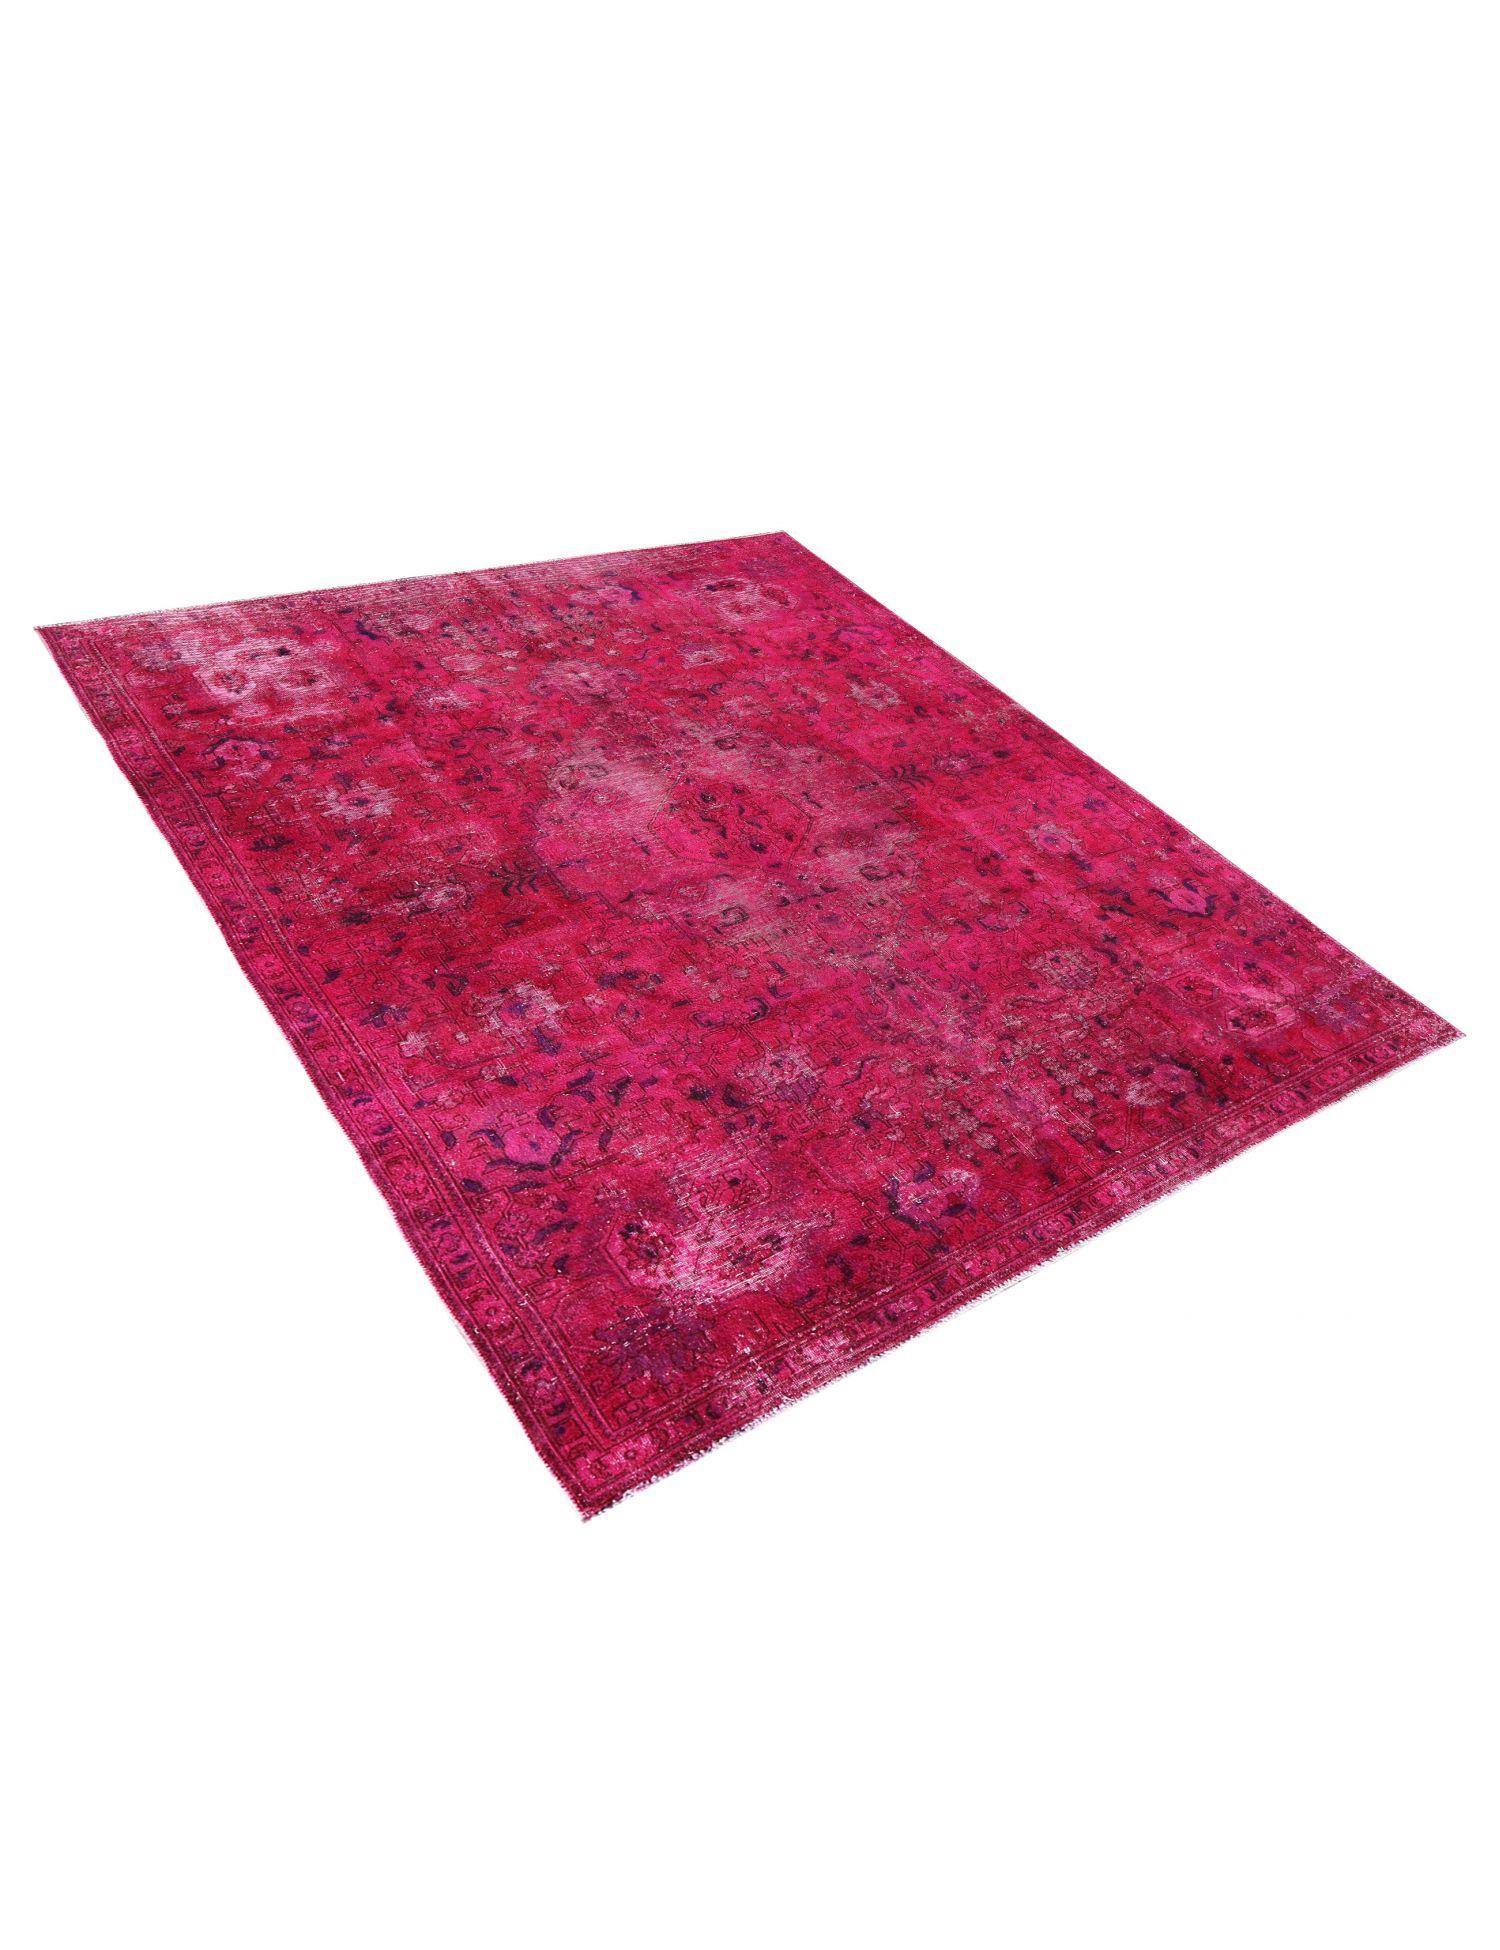 Vintage Teppich  rot <br/>325 x 235 cm